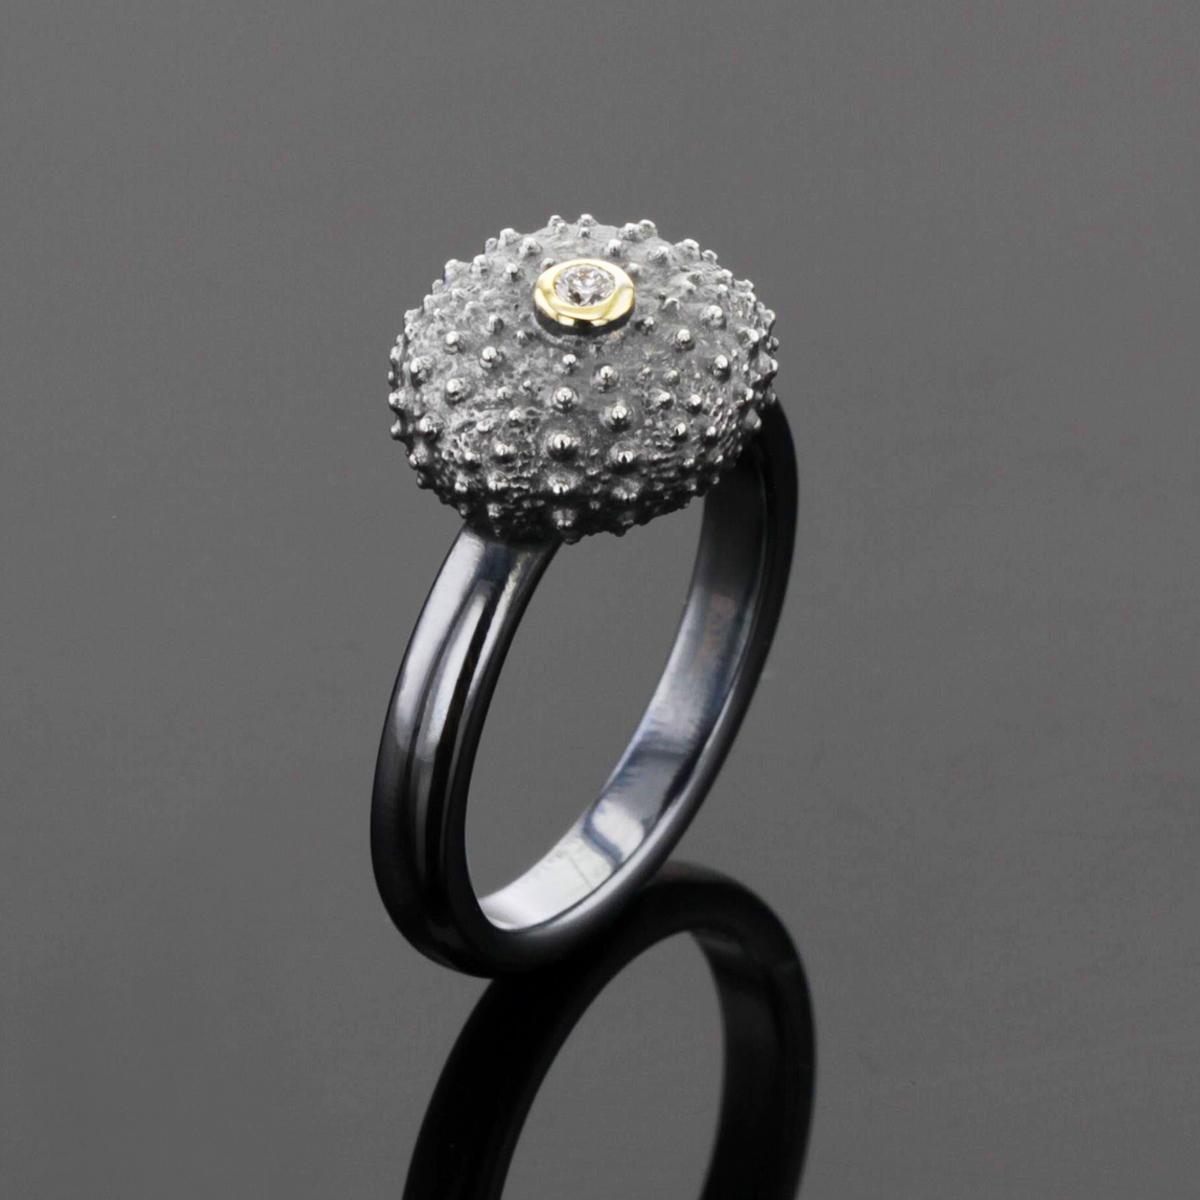 Black sea urchin ring